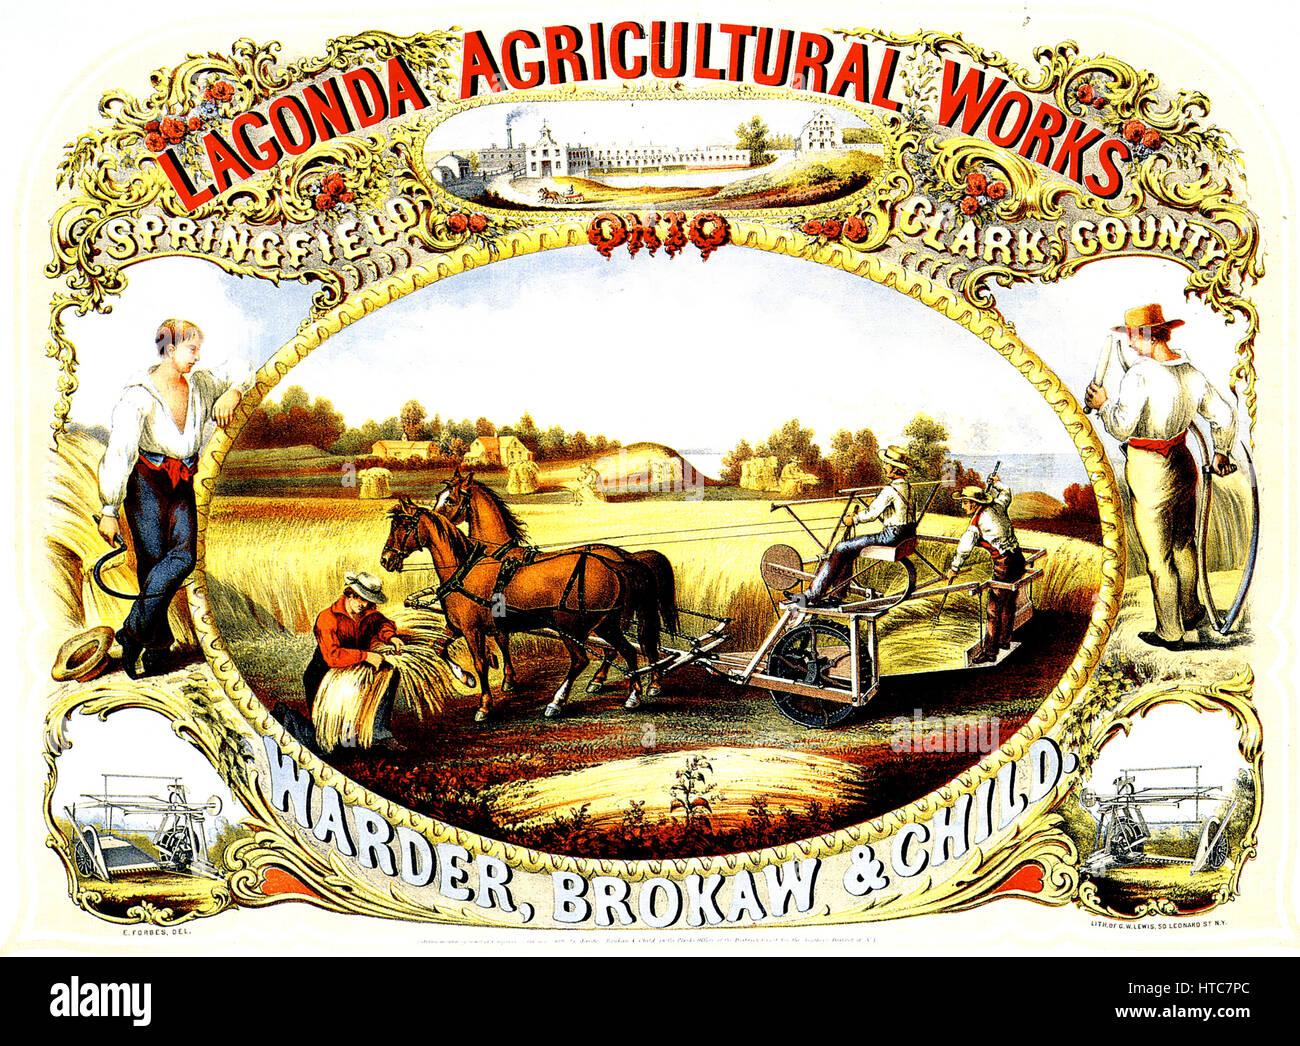 LAGONDA AGRICULTURAL WORKS, Ohio. 1859 lithograph - Stock Image